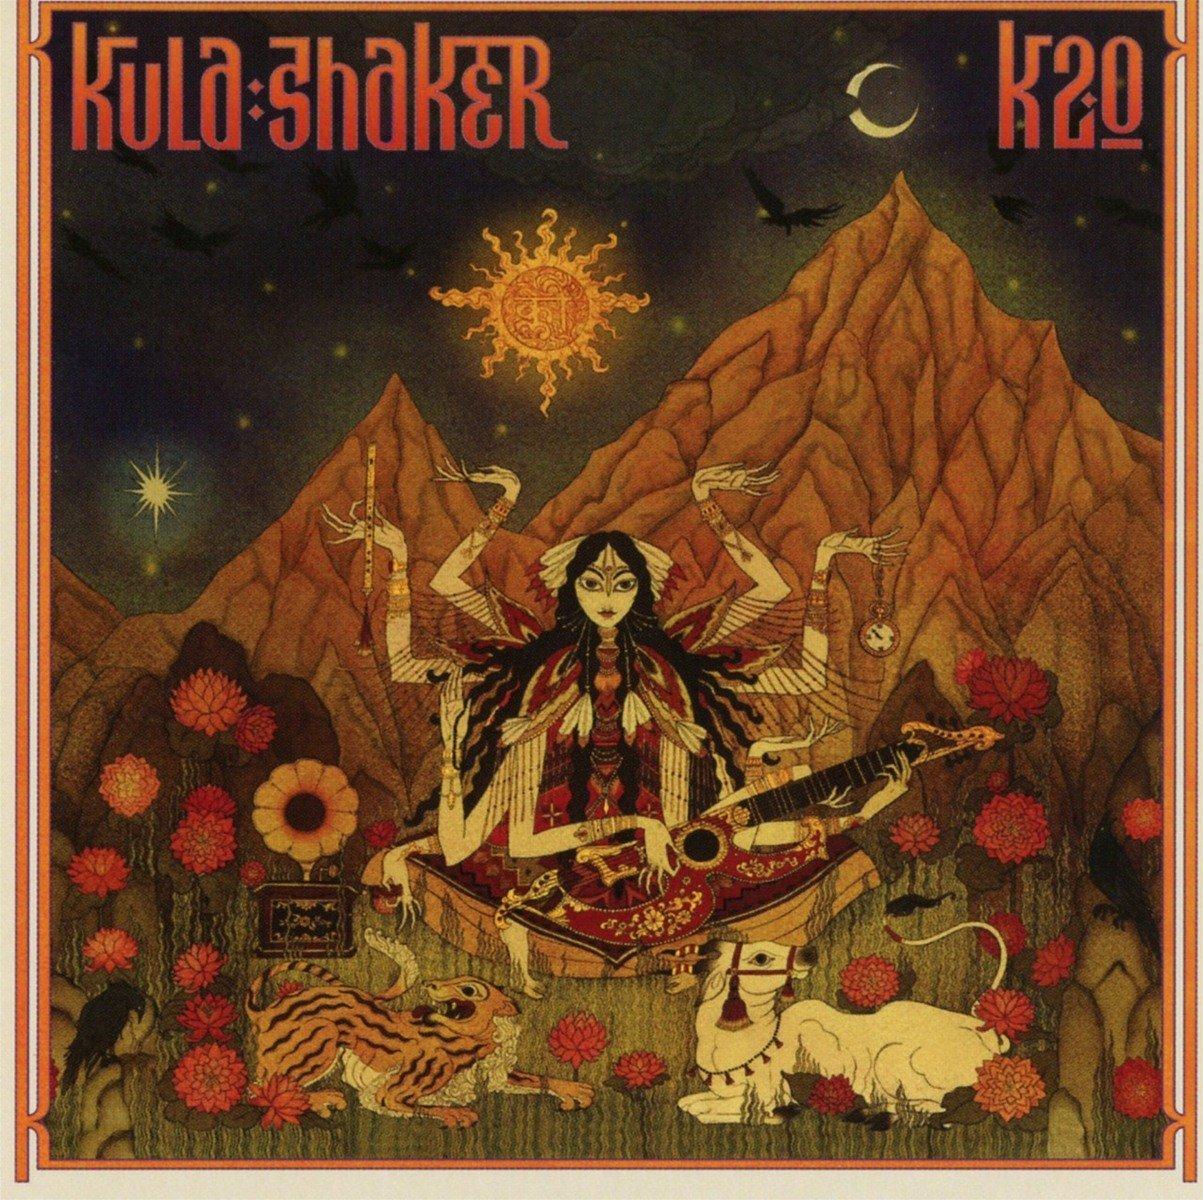 Kula Shaker: k2.0 (2016) Book Cover